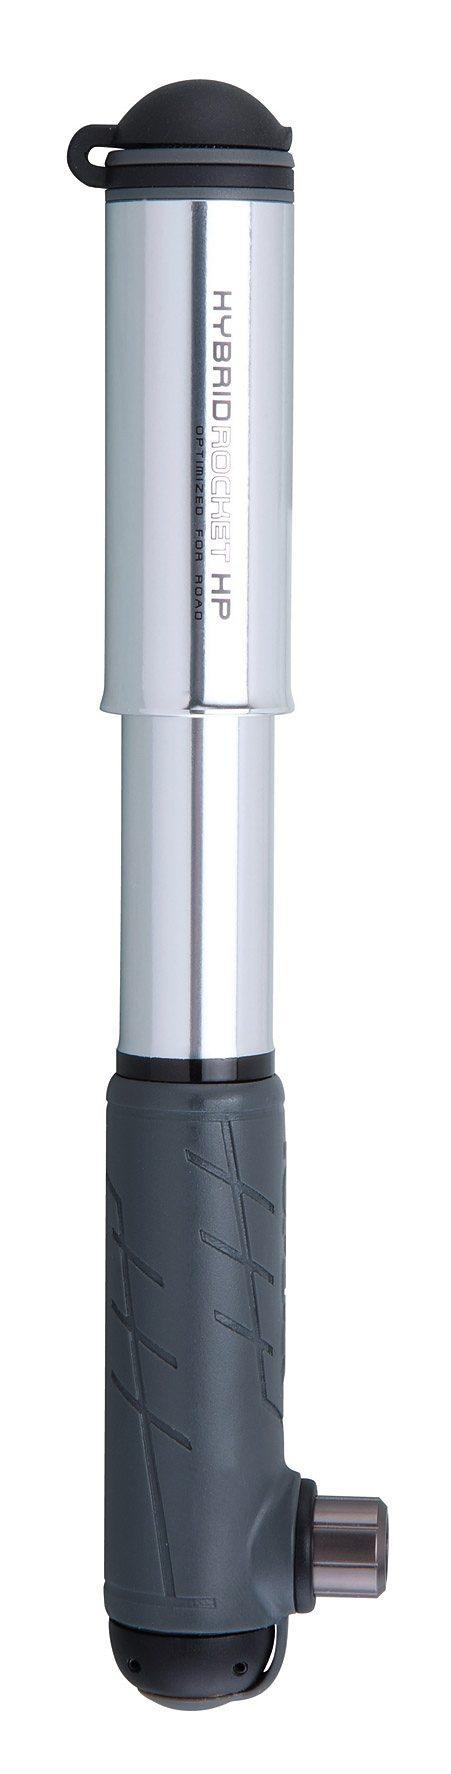 Topeak Fahrradpumpe »Hybrid Rocket HP silber«